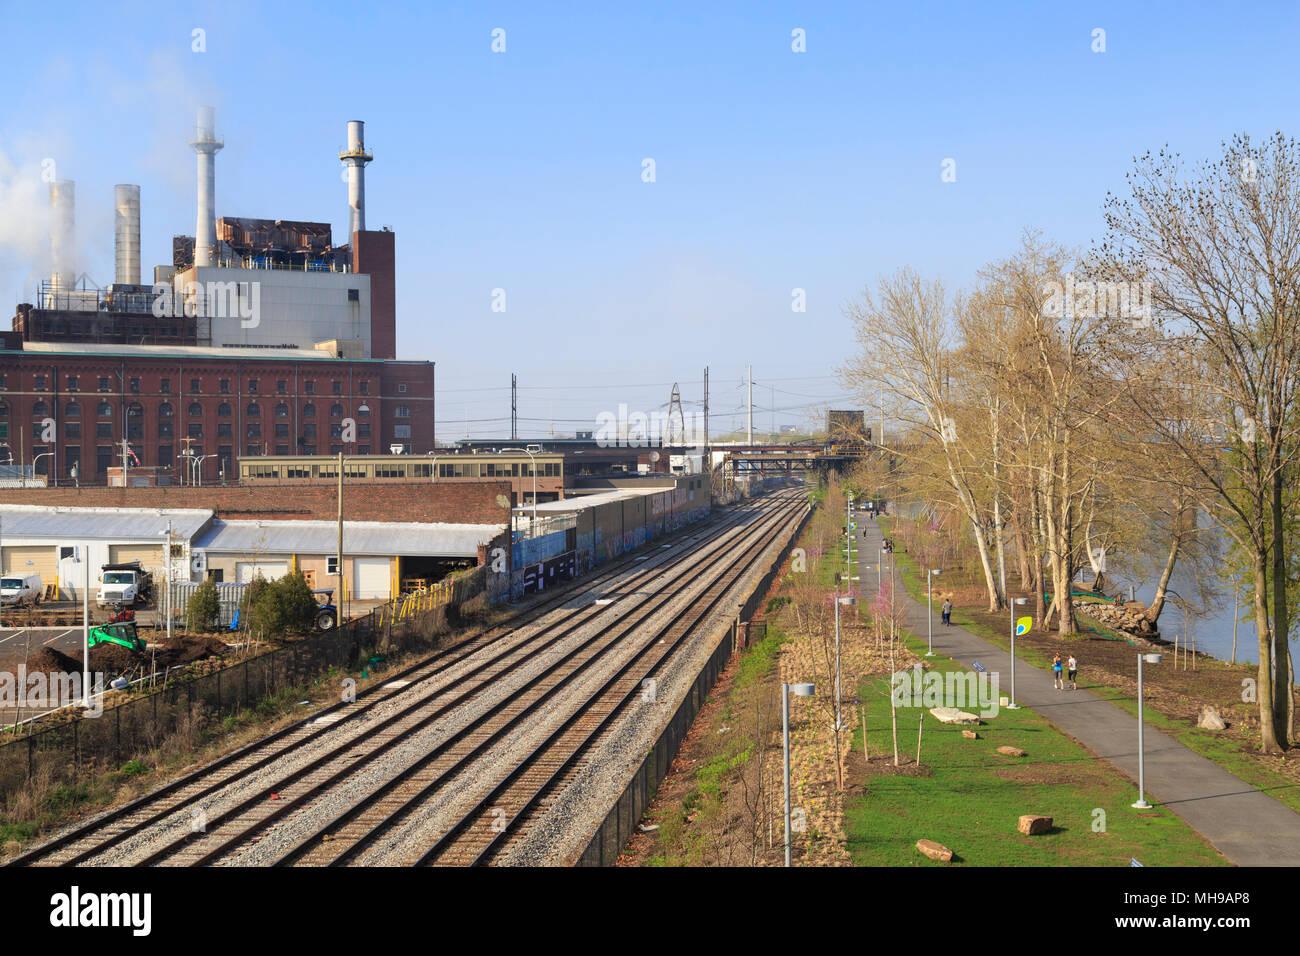 Schuylkill Banks Recreation Path and train tracksin revitalized industrial area with Veolia Thermal Energy Plant, Philadelphia , Pennsylvania, USA - Stock Image